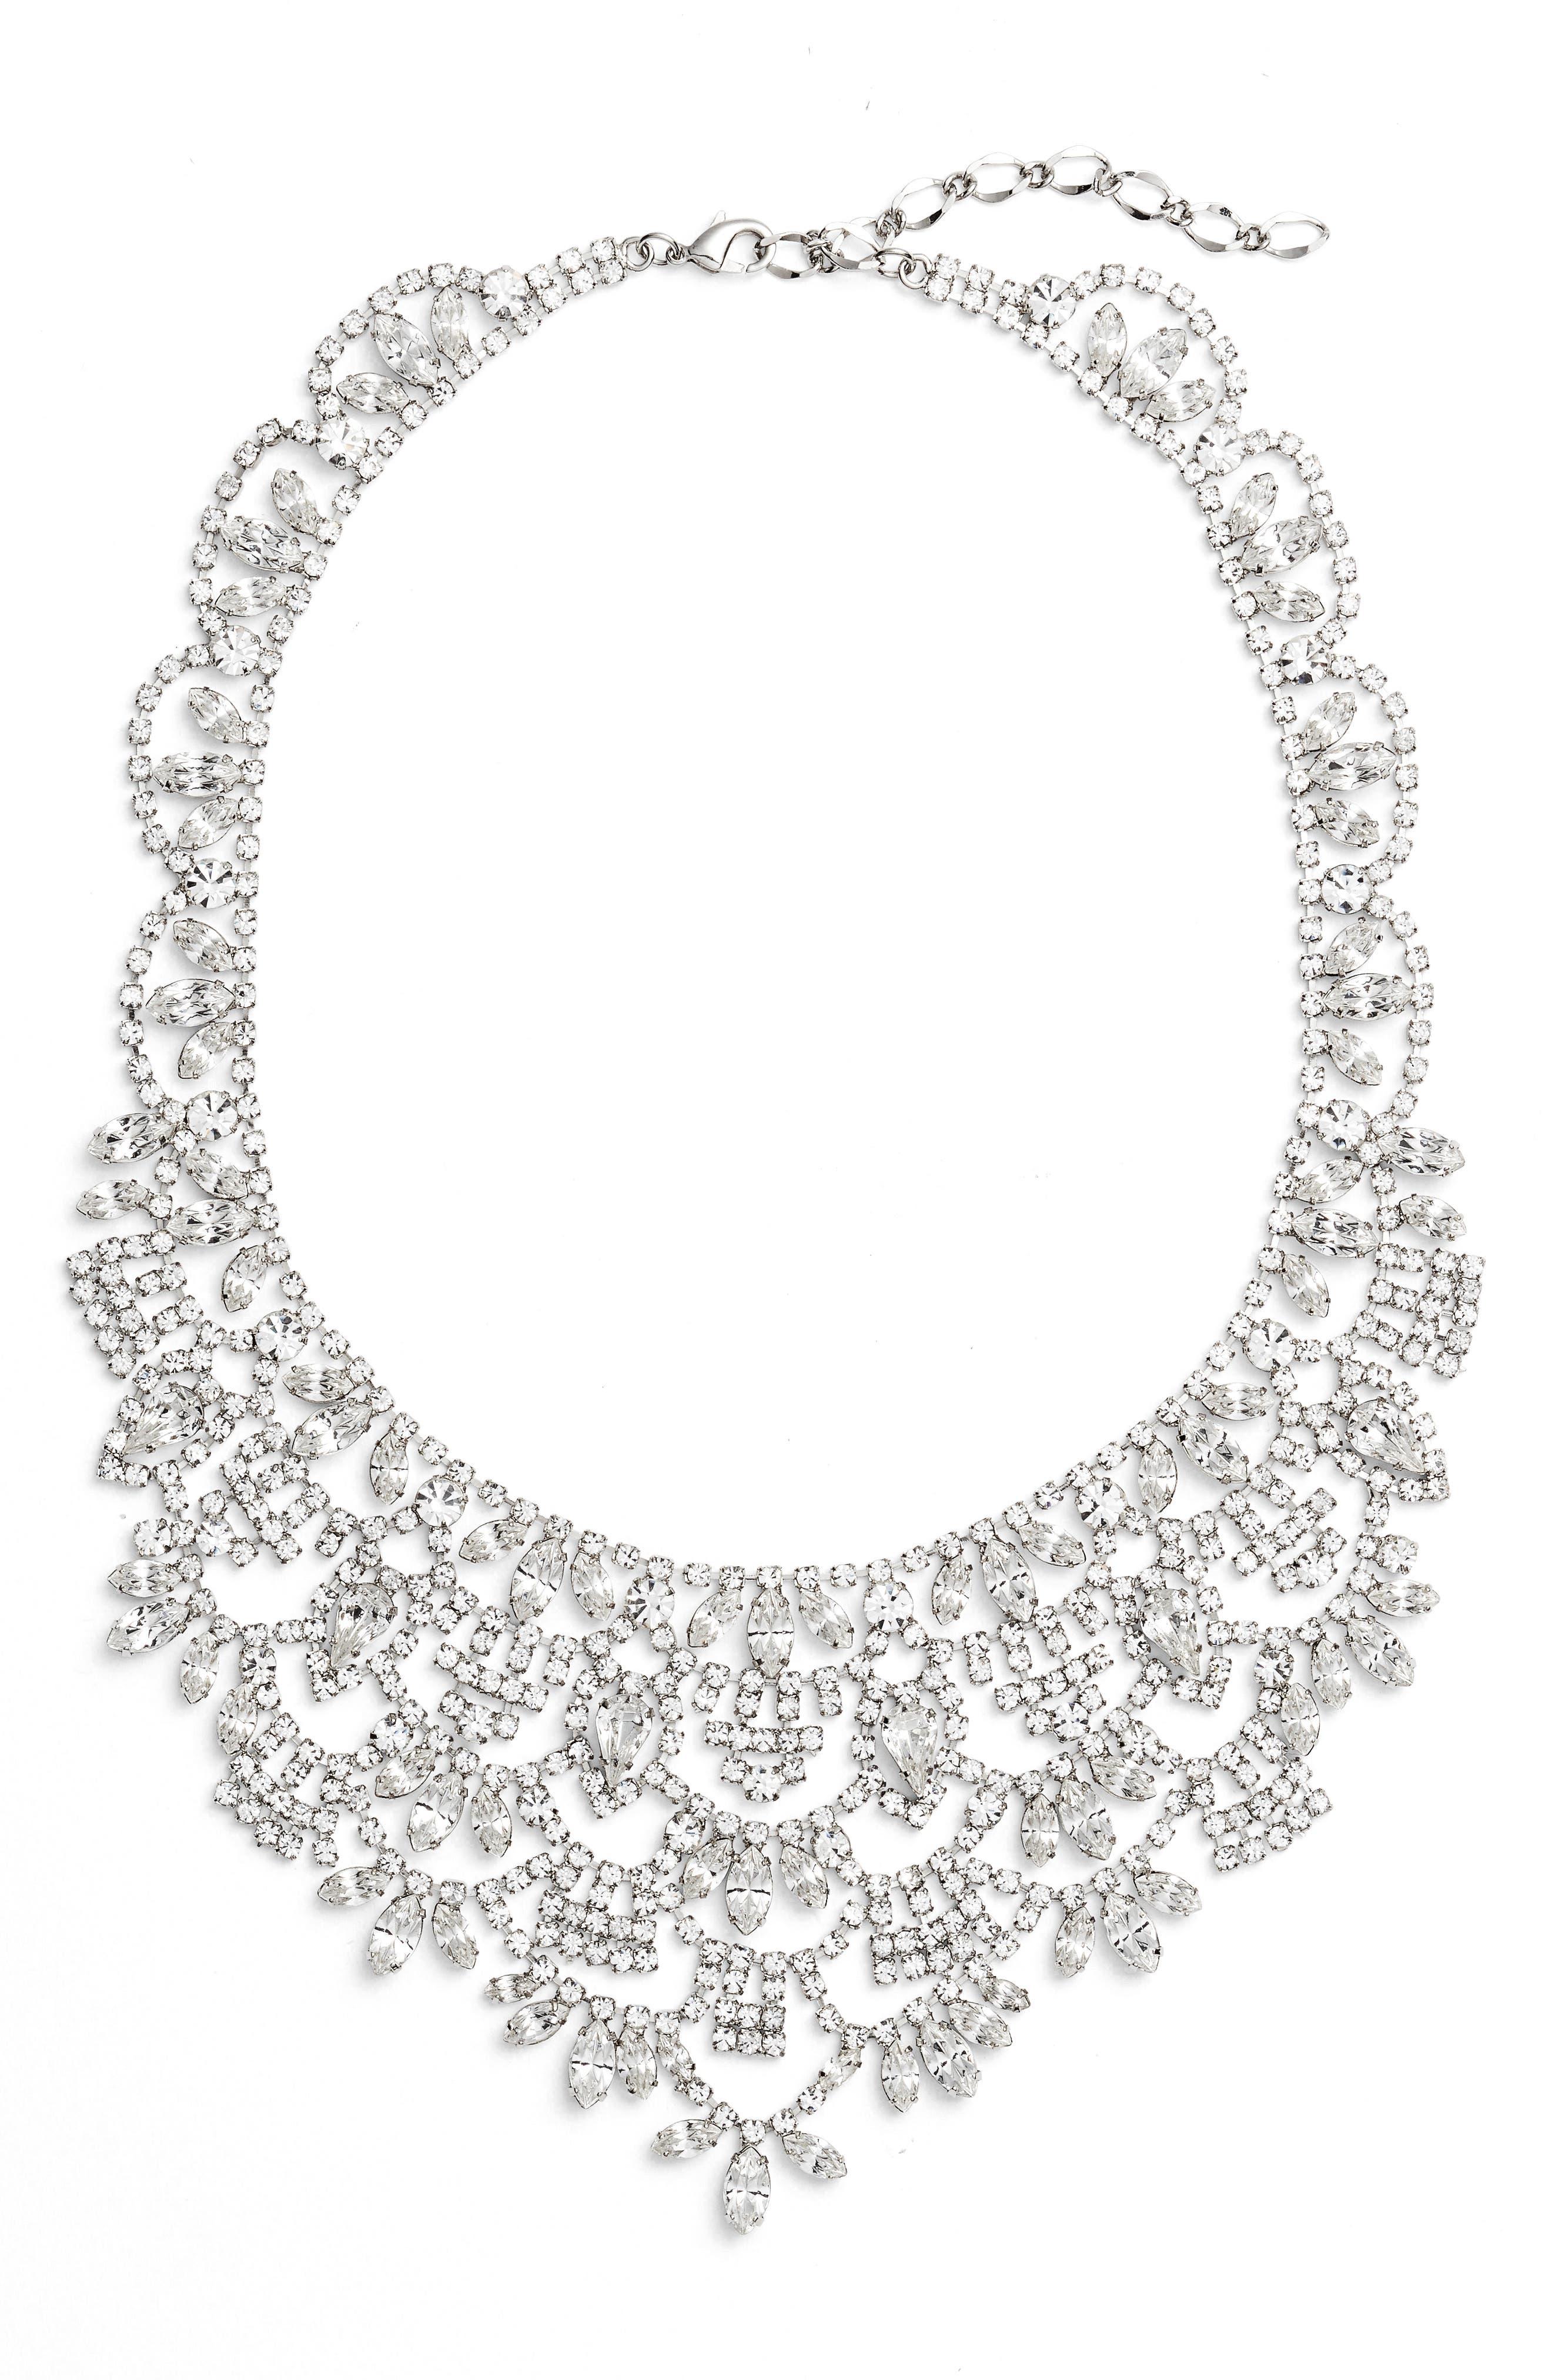 Main Image - CRISTABELLE Crystal Bib Necklace